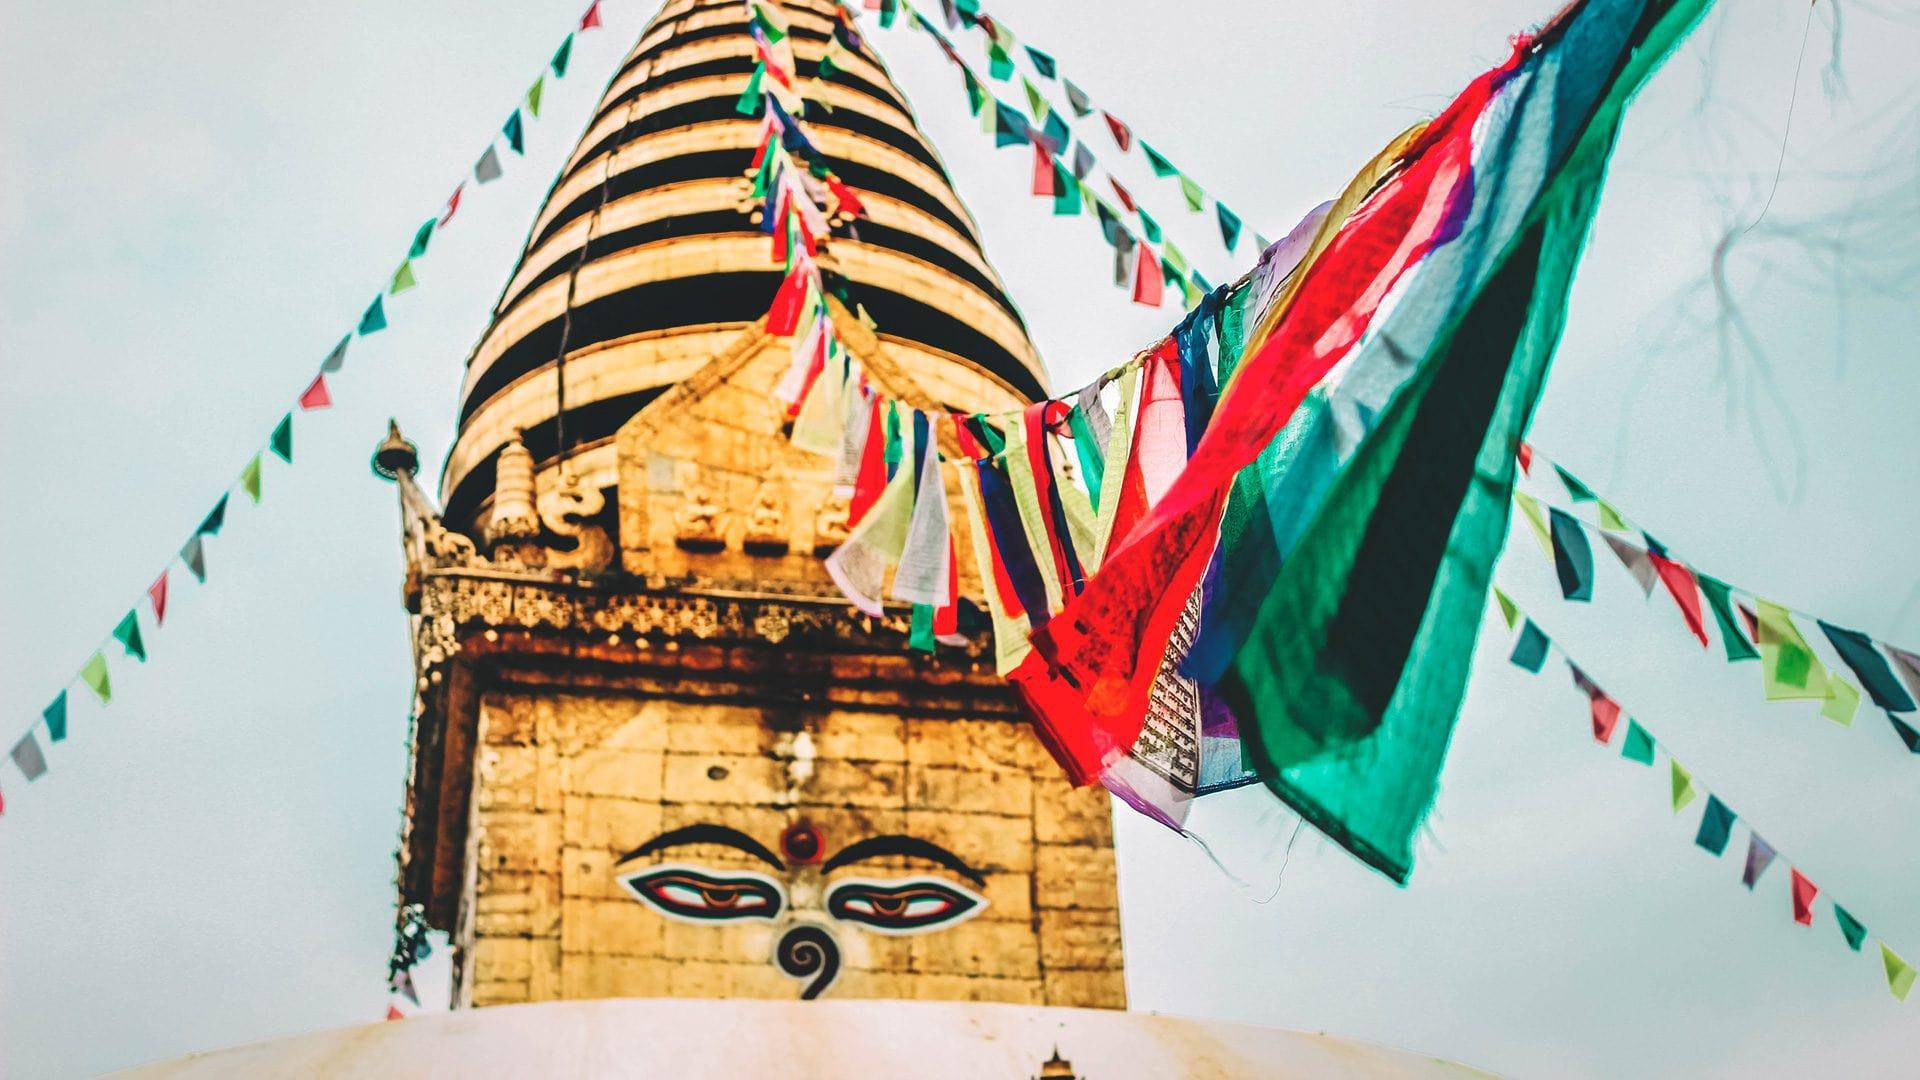 Qué ver en Kathmandu | Rojo Cangrejo Blog de Viajes